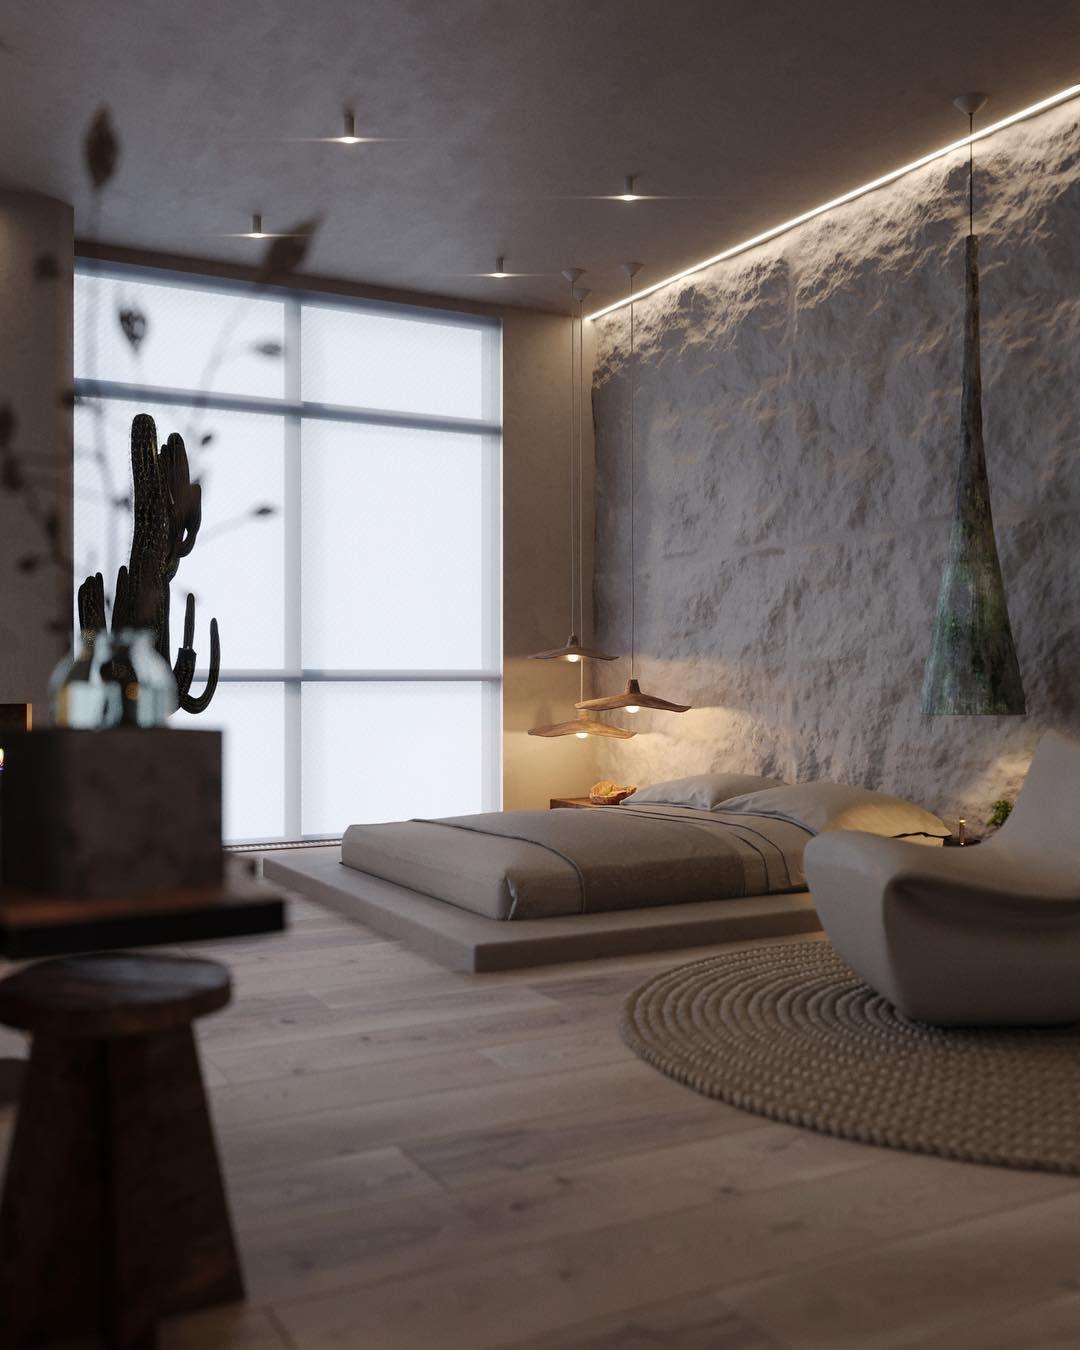 15 Peaceful Asian Living Room Interiors Designed For Comfort: 2,615 Me Gusta, 15 Comentarios